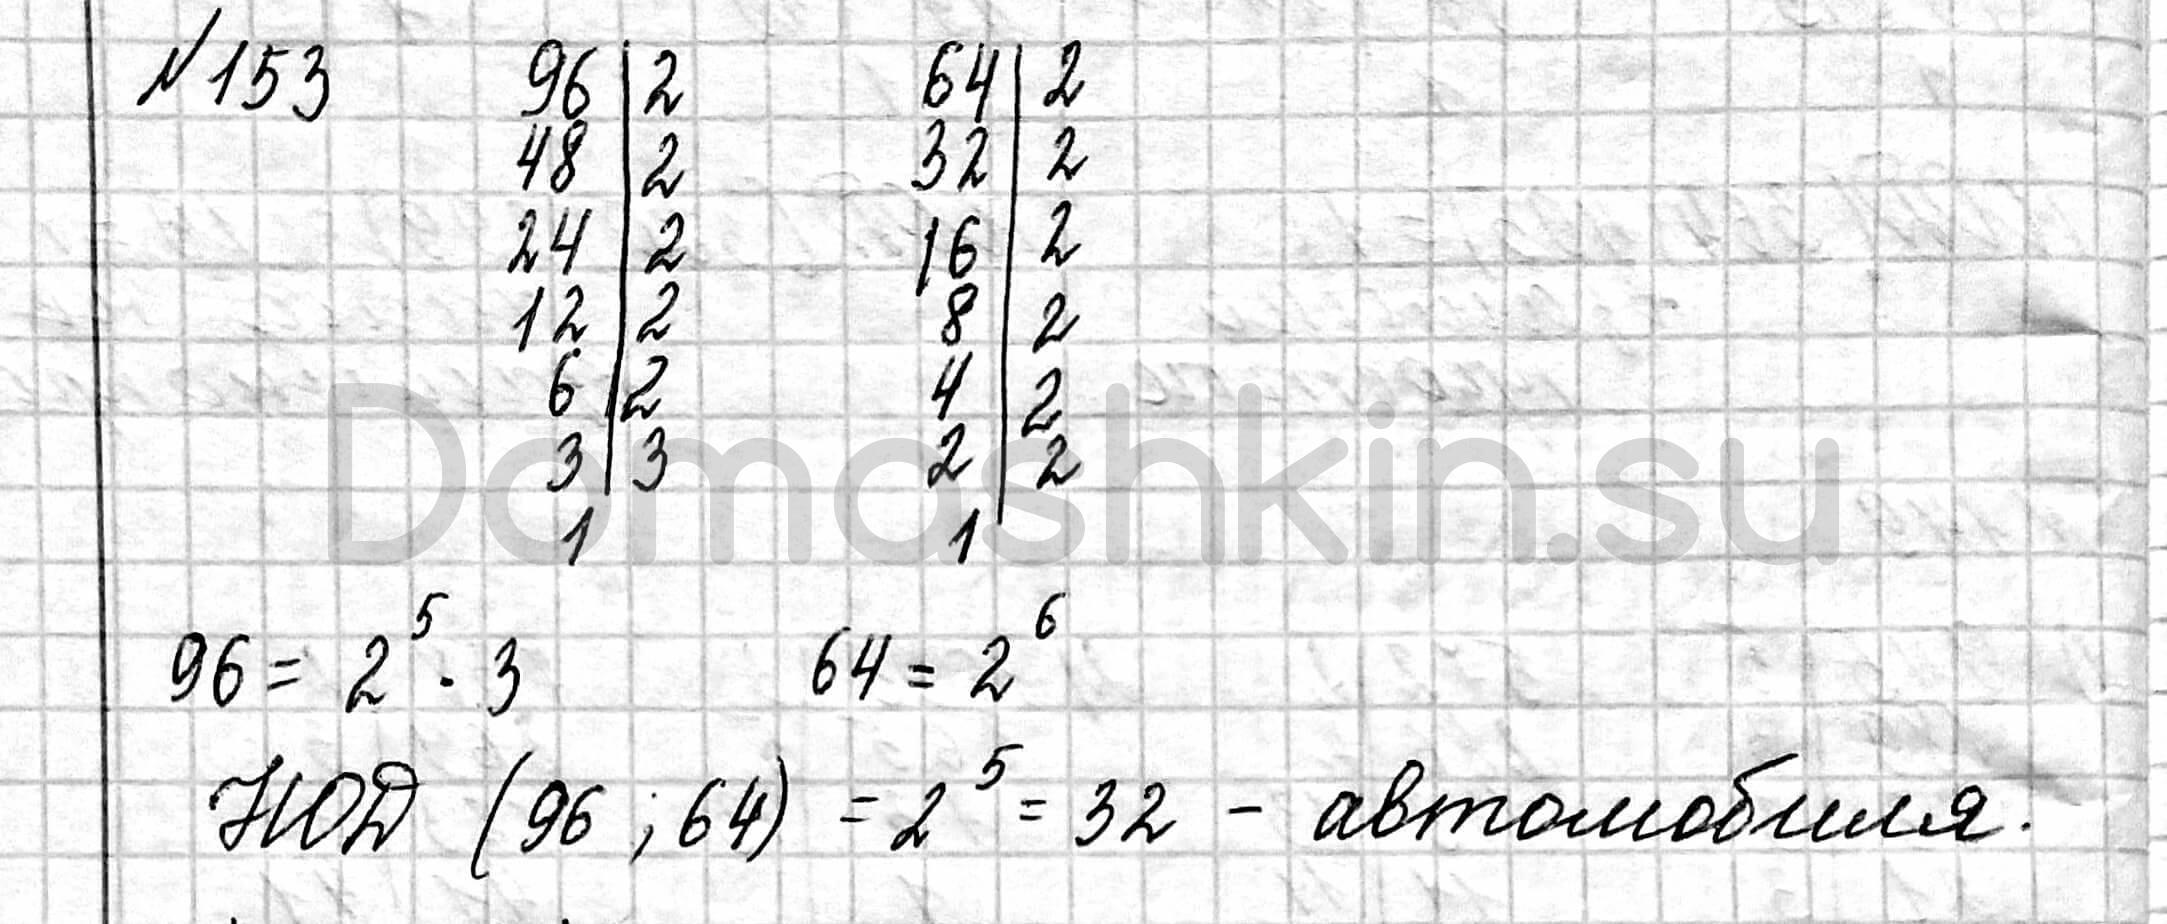 Математика 6 класс учебник Мерзляк номер 153 решение